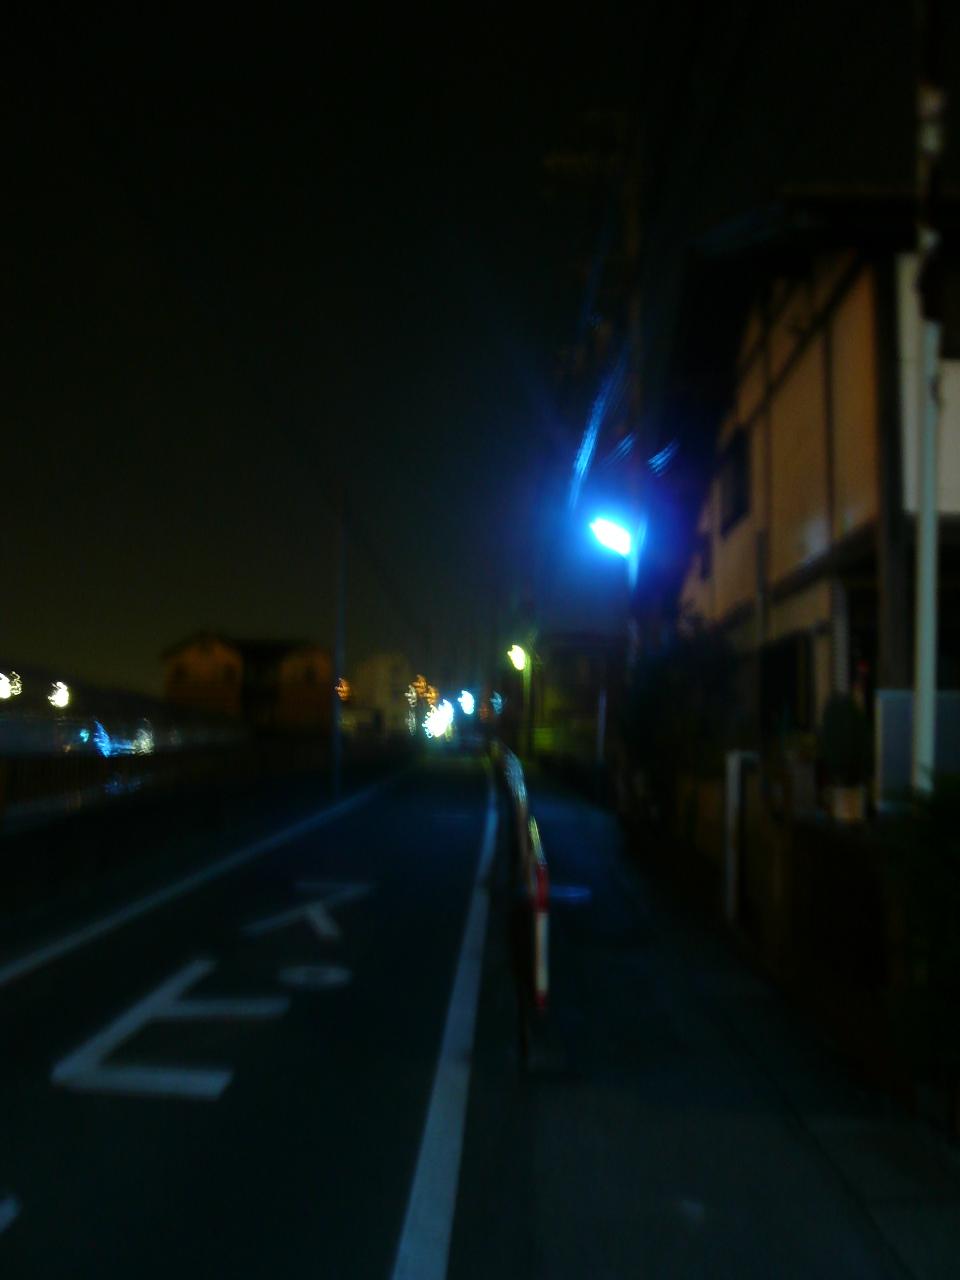 http://img.blogs.yahoo.co.jp/ybi/1/13/f5/tetsutaro499/folder/420377/img_420377_49377359_0?1258290271